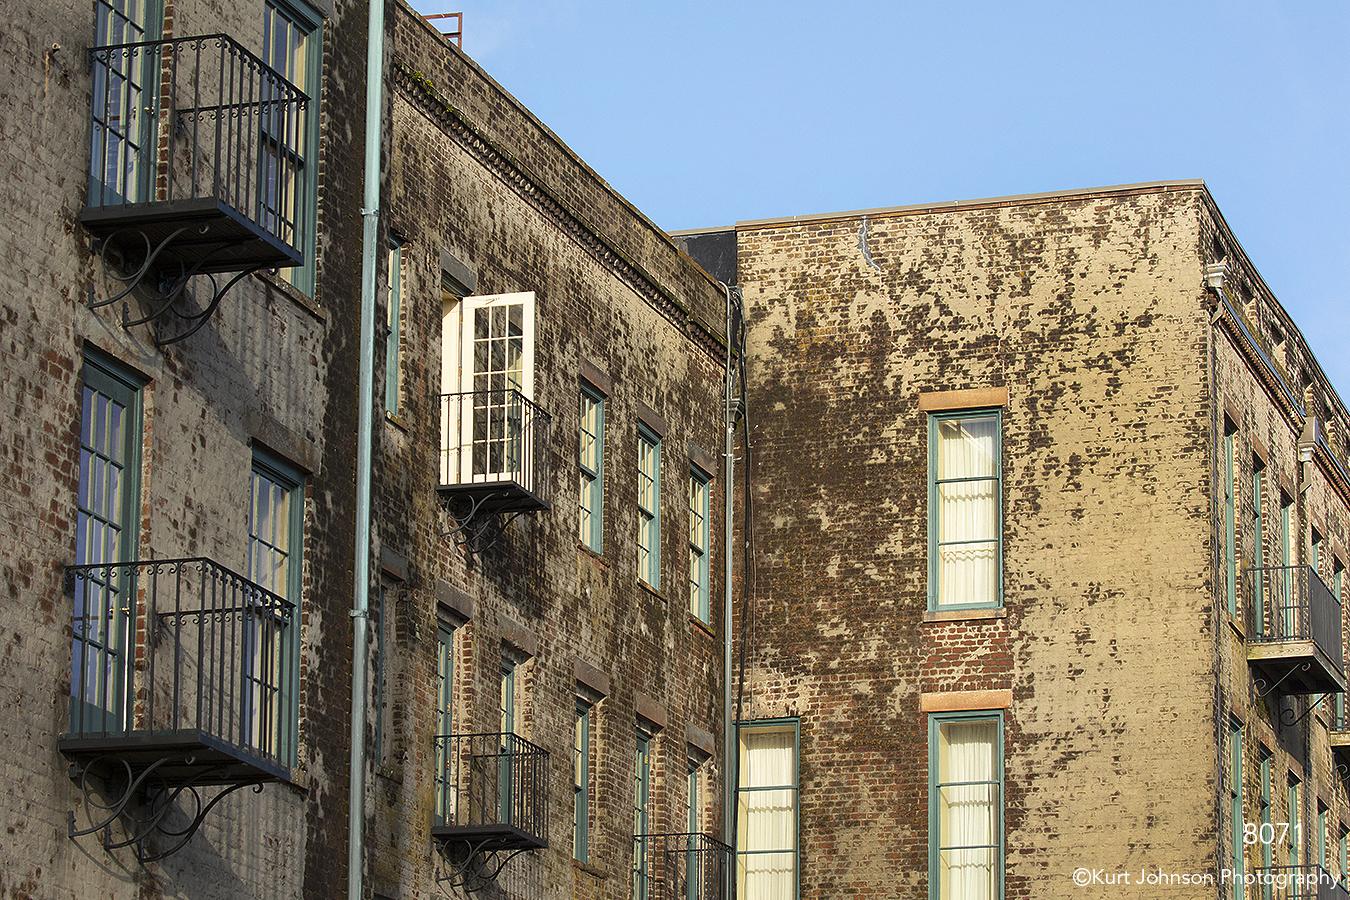 southeast urban architectural landscape